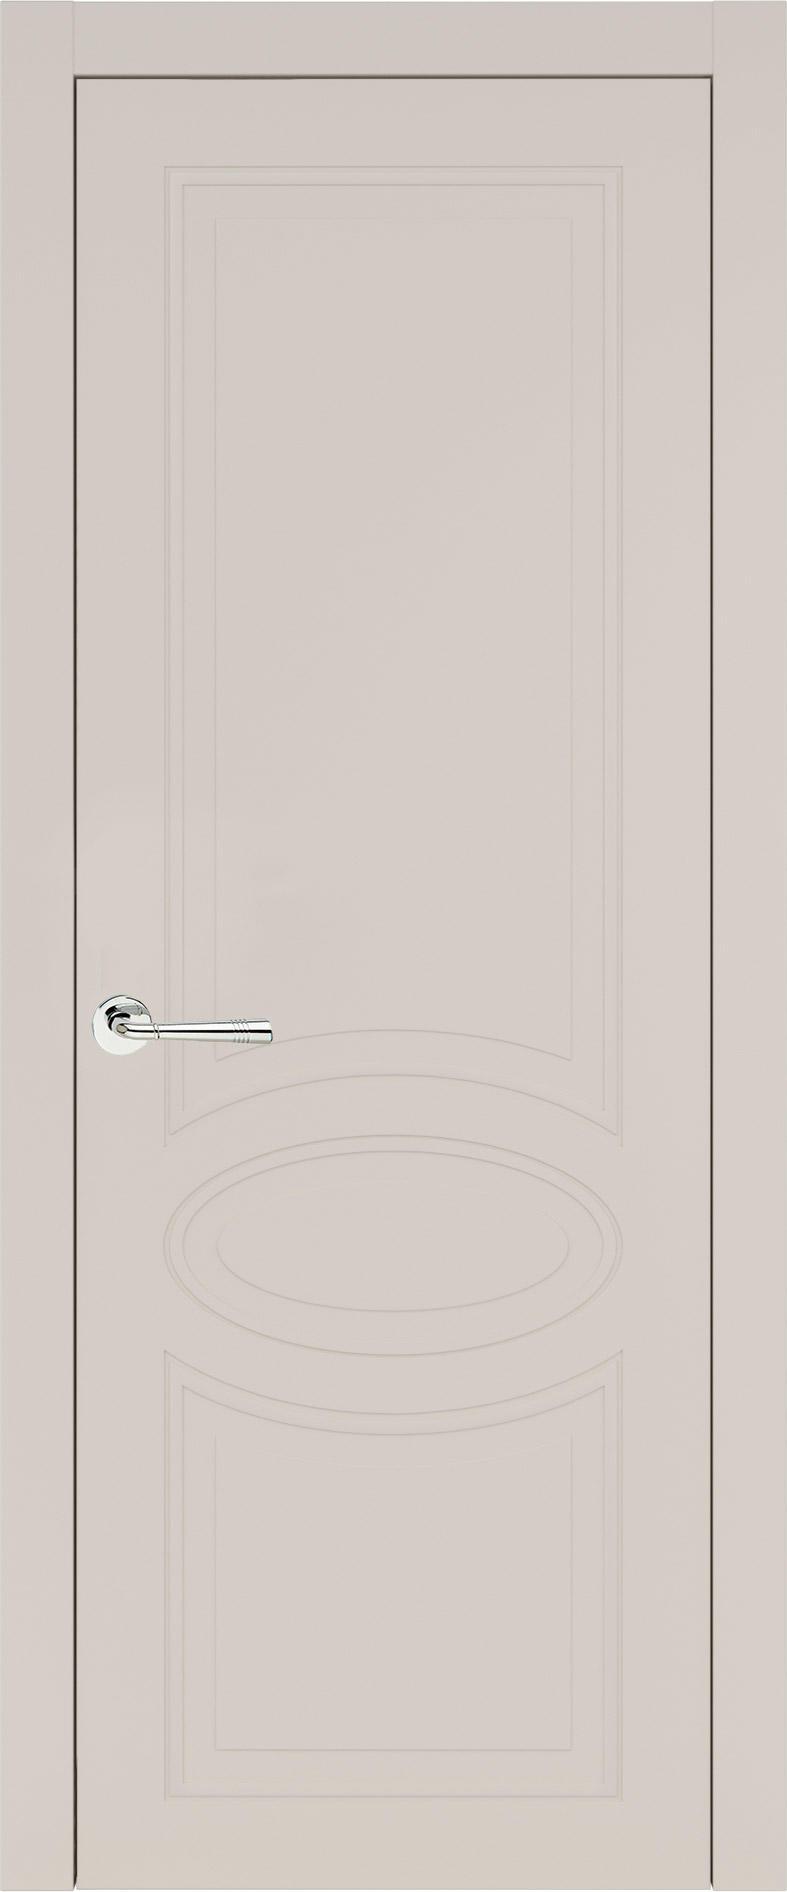 Florencia Neo Classic цвет - Жемчужная эмаль (RAL 1013) Без стекла (ДГ)